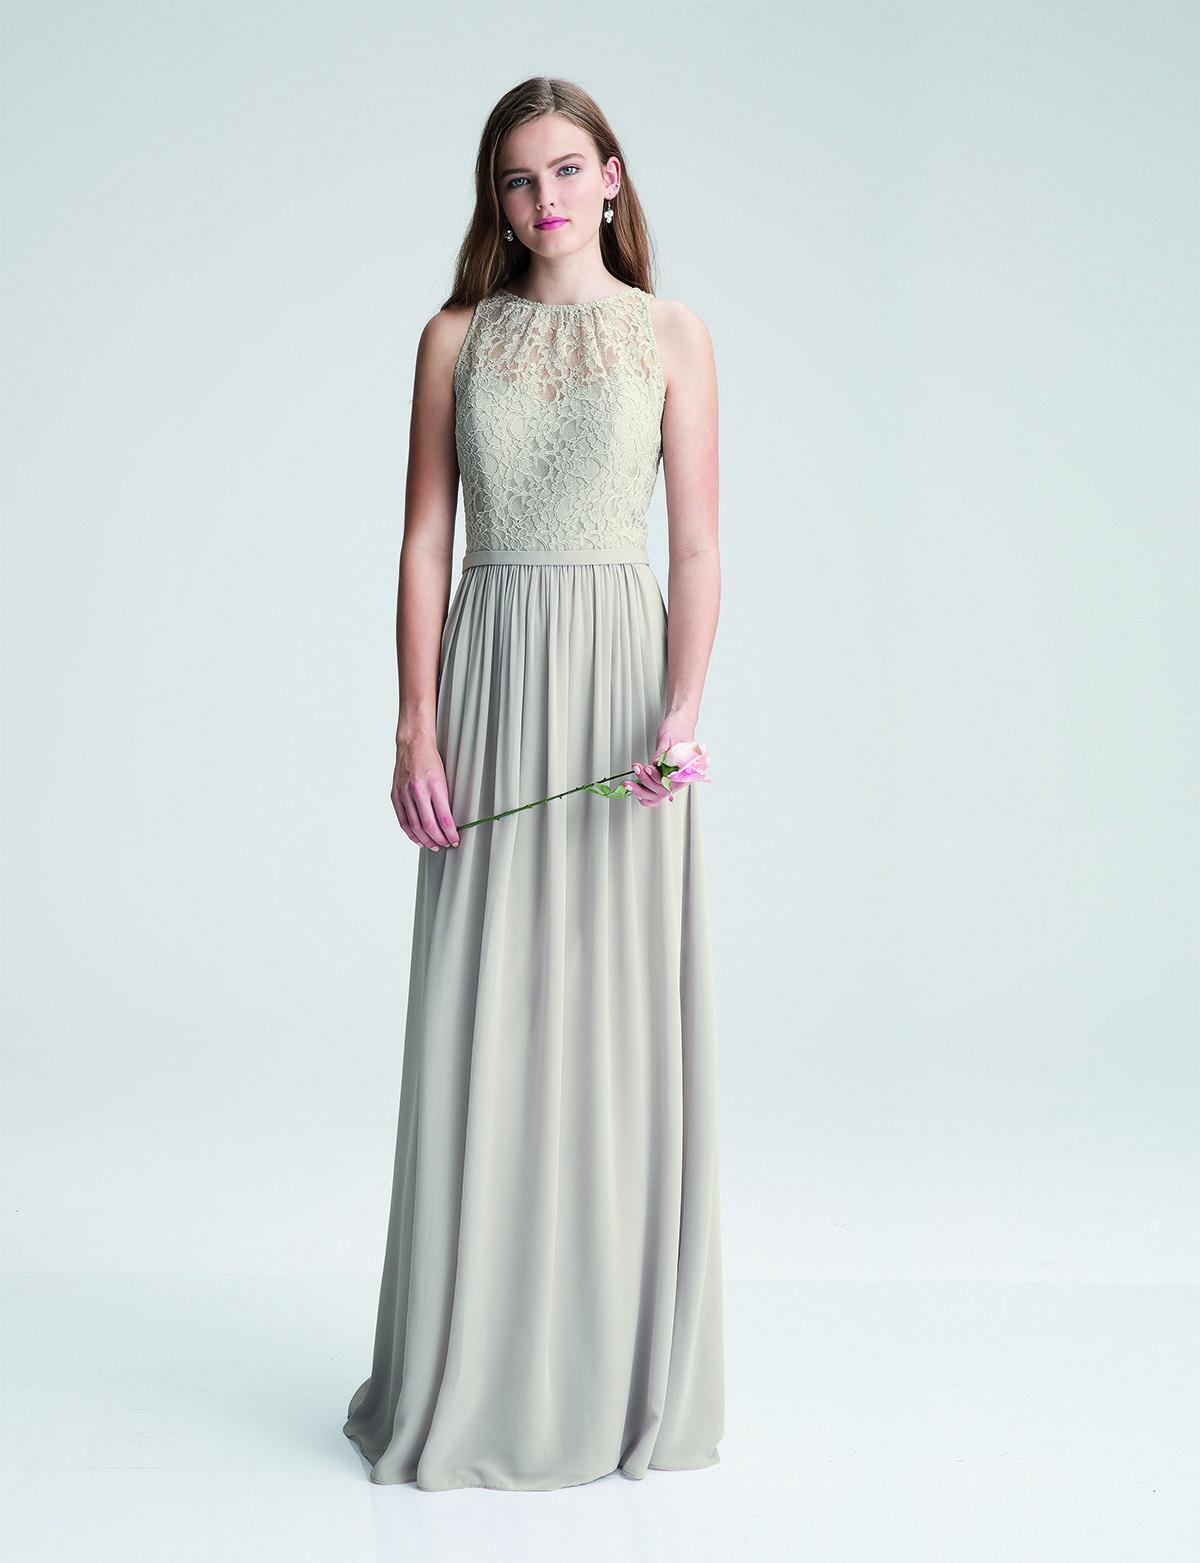 Bridesmaid dress style 1218 bridesmaid dresses by bill levkoff style 1411 in desert grey bill levkoff springsummer 17 collection ombrellifo Gallery